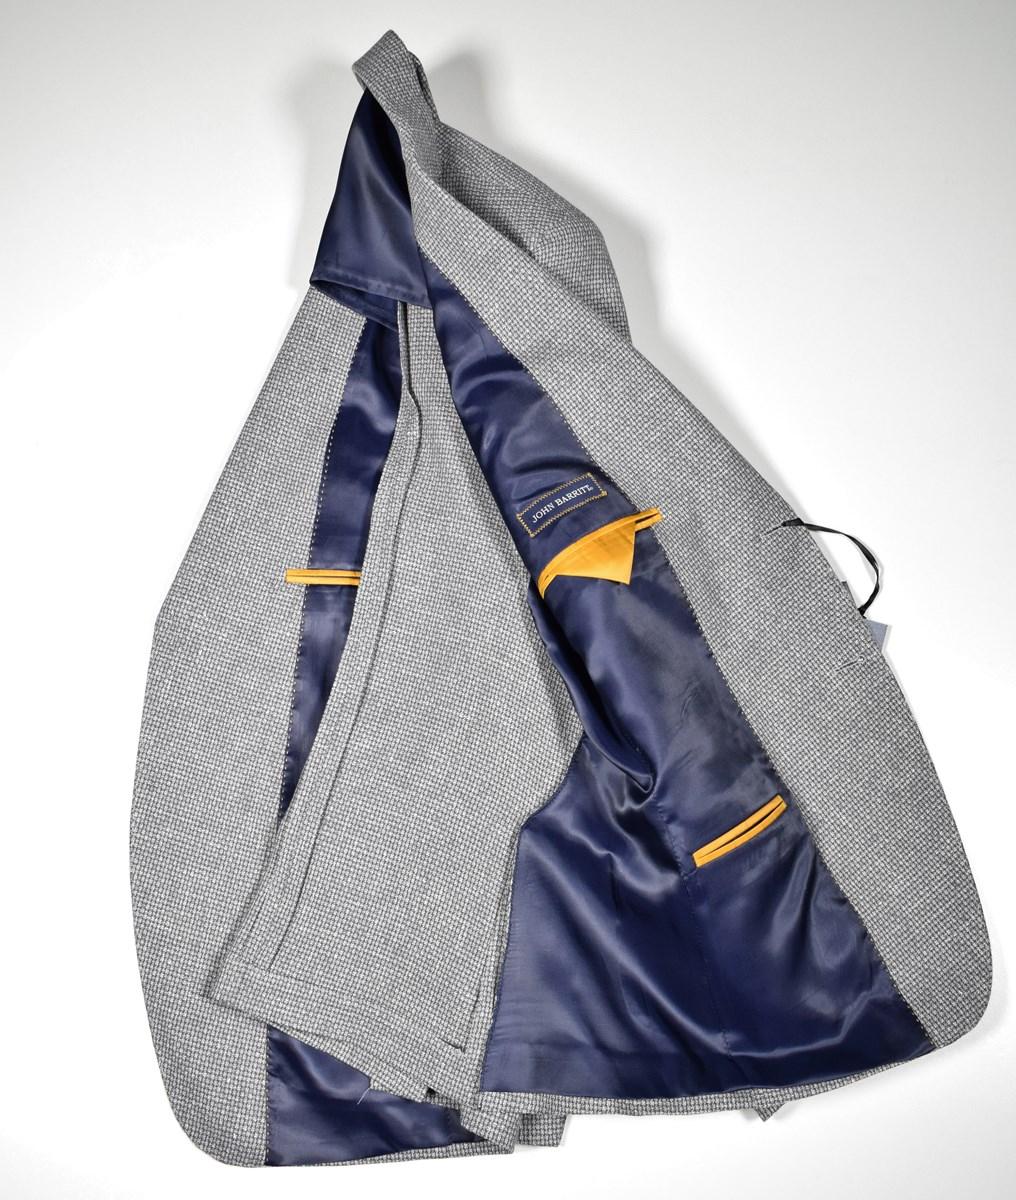 Giacca Blazer Grigio John Barritt Con Toppe Slim Fit Sfoderata Cotone E Lino Men's Clothing Clothing, Shoes & Accessories